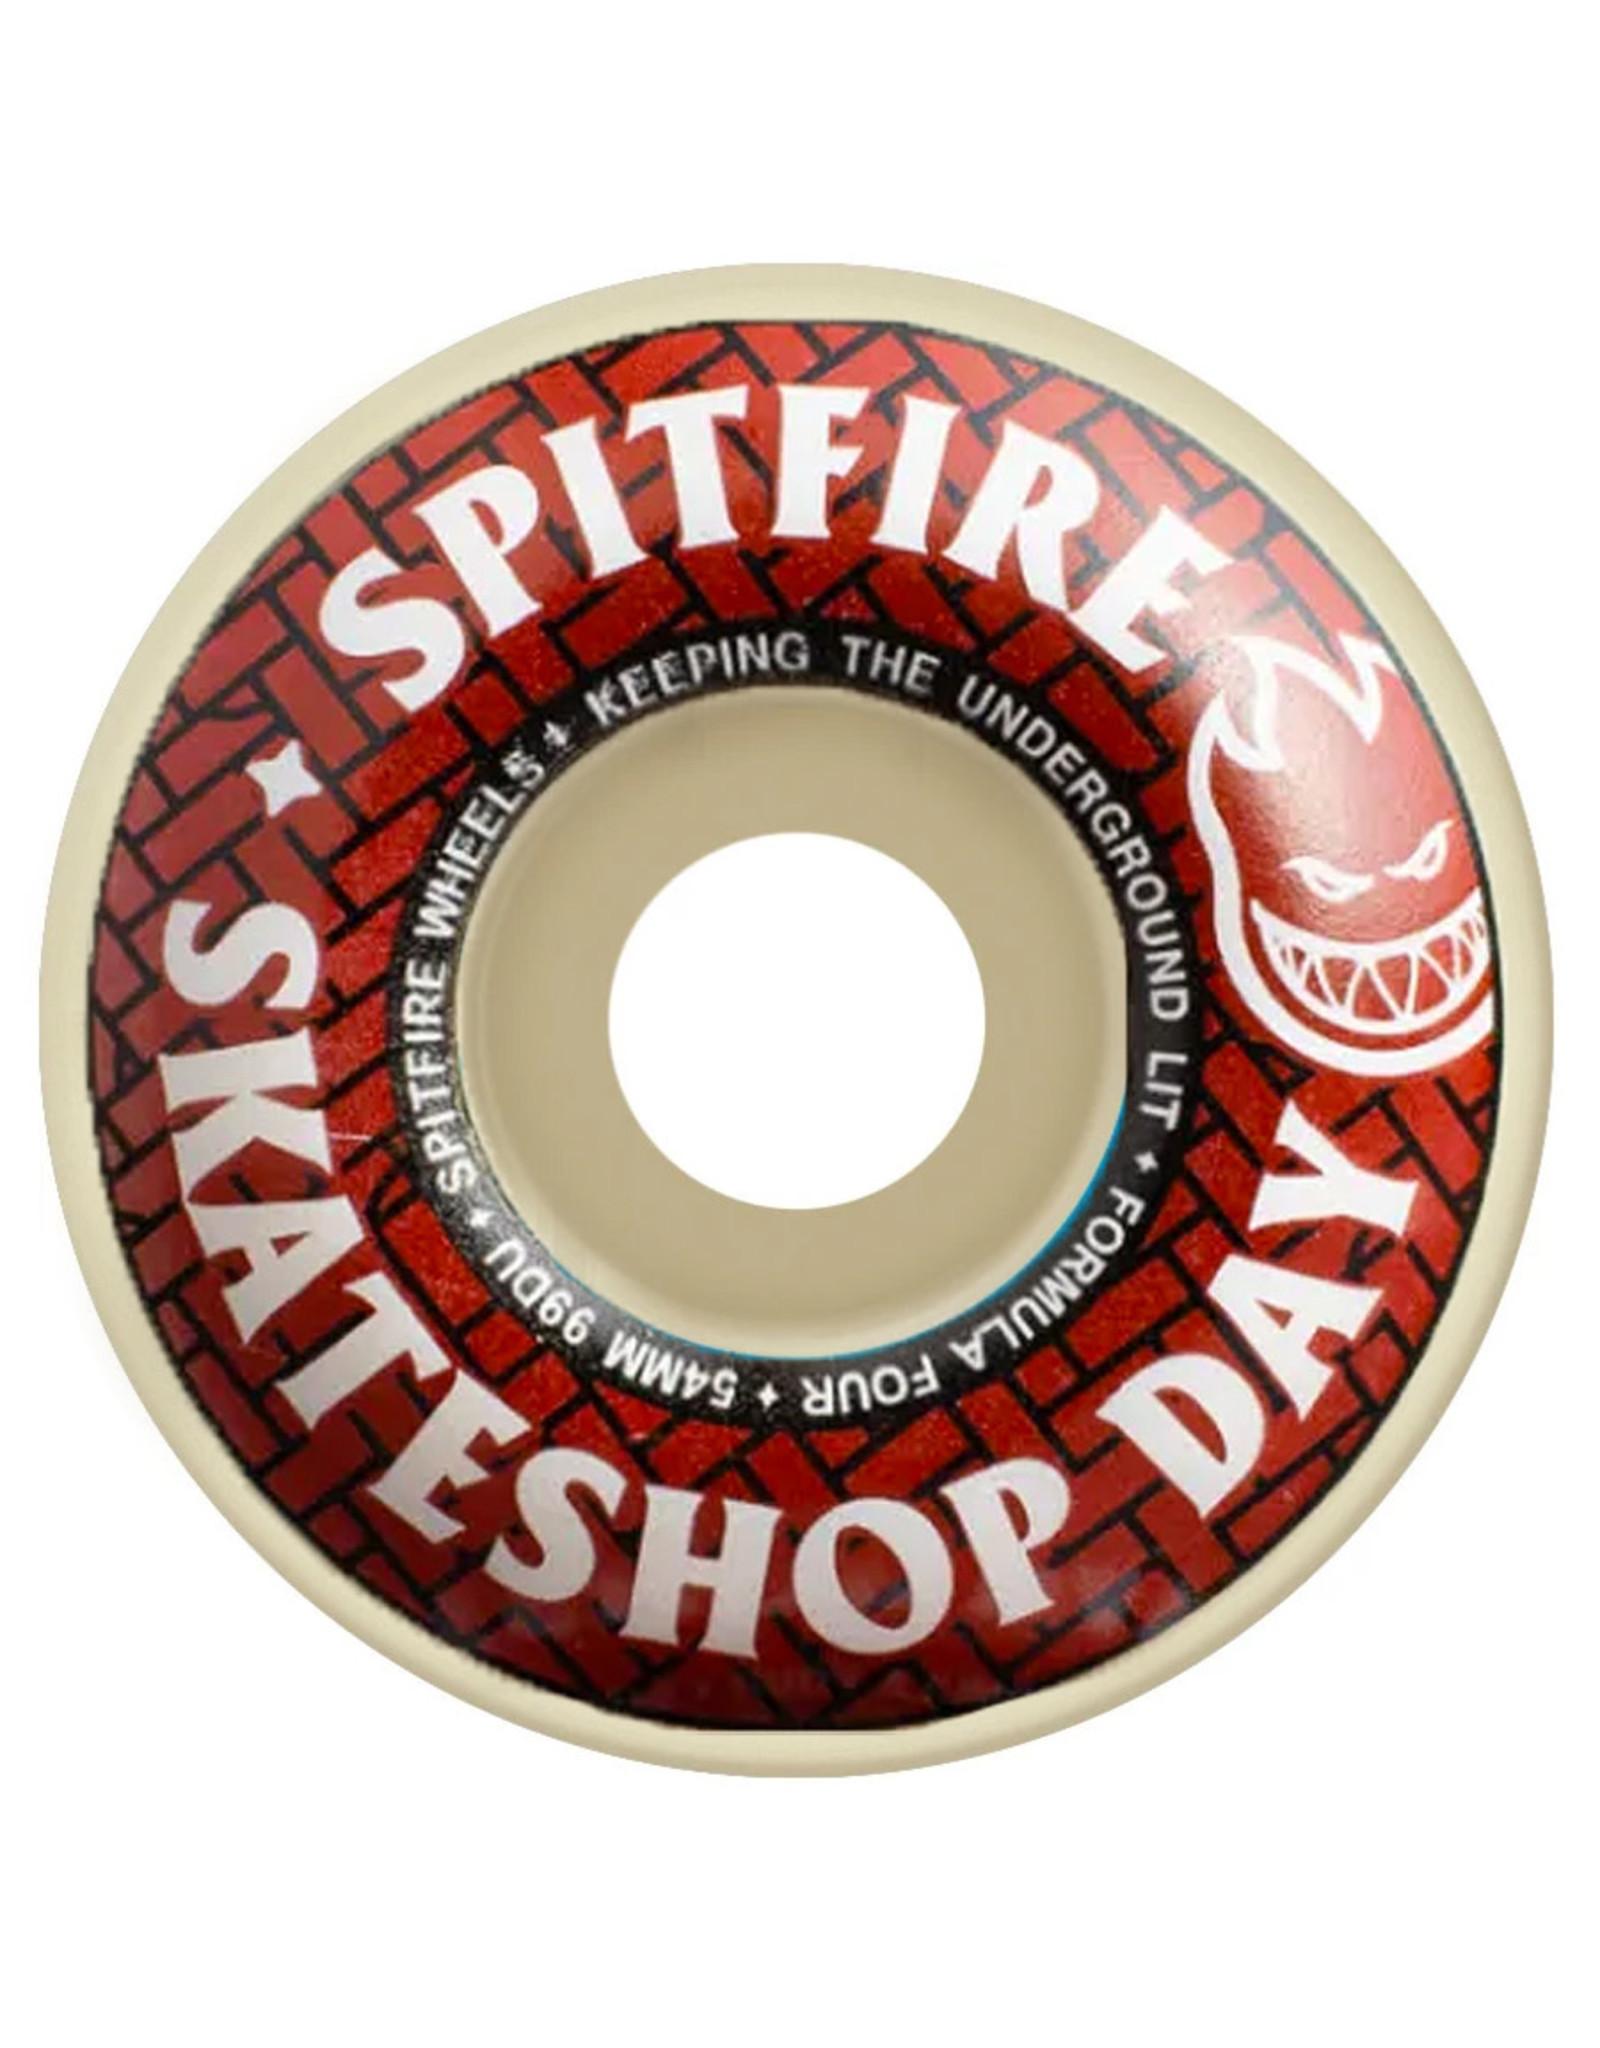 Spitfire Spitfire Wheels Formula Four Skate Shop Day Classic White (54mm/99d)